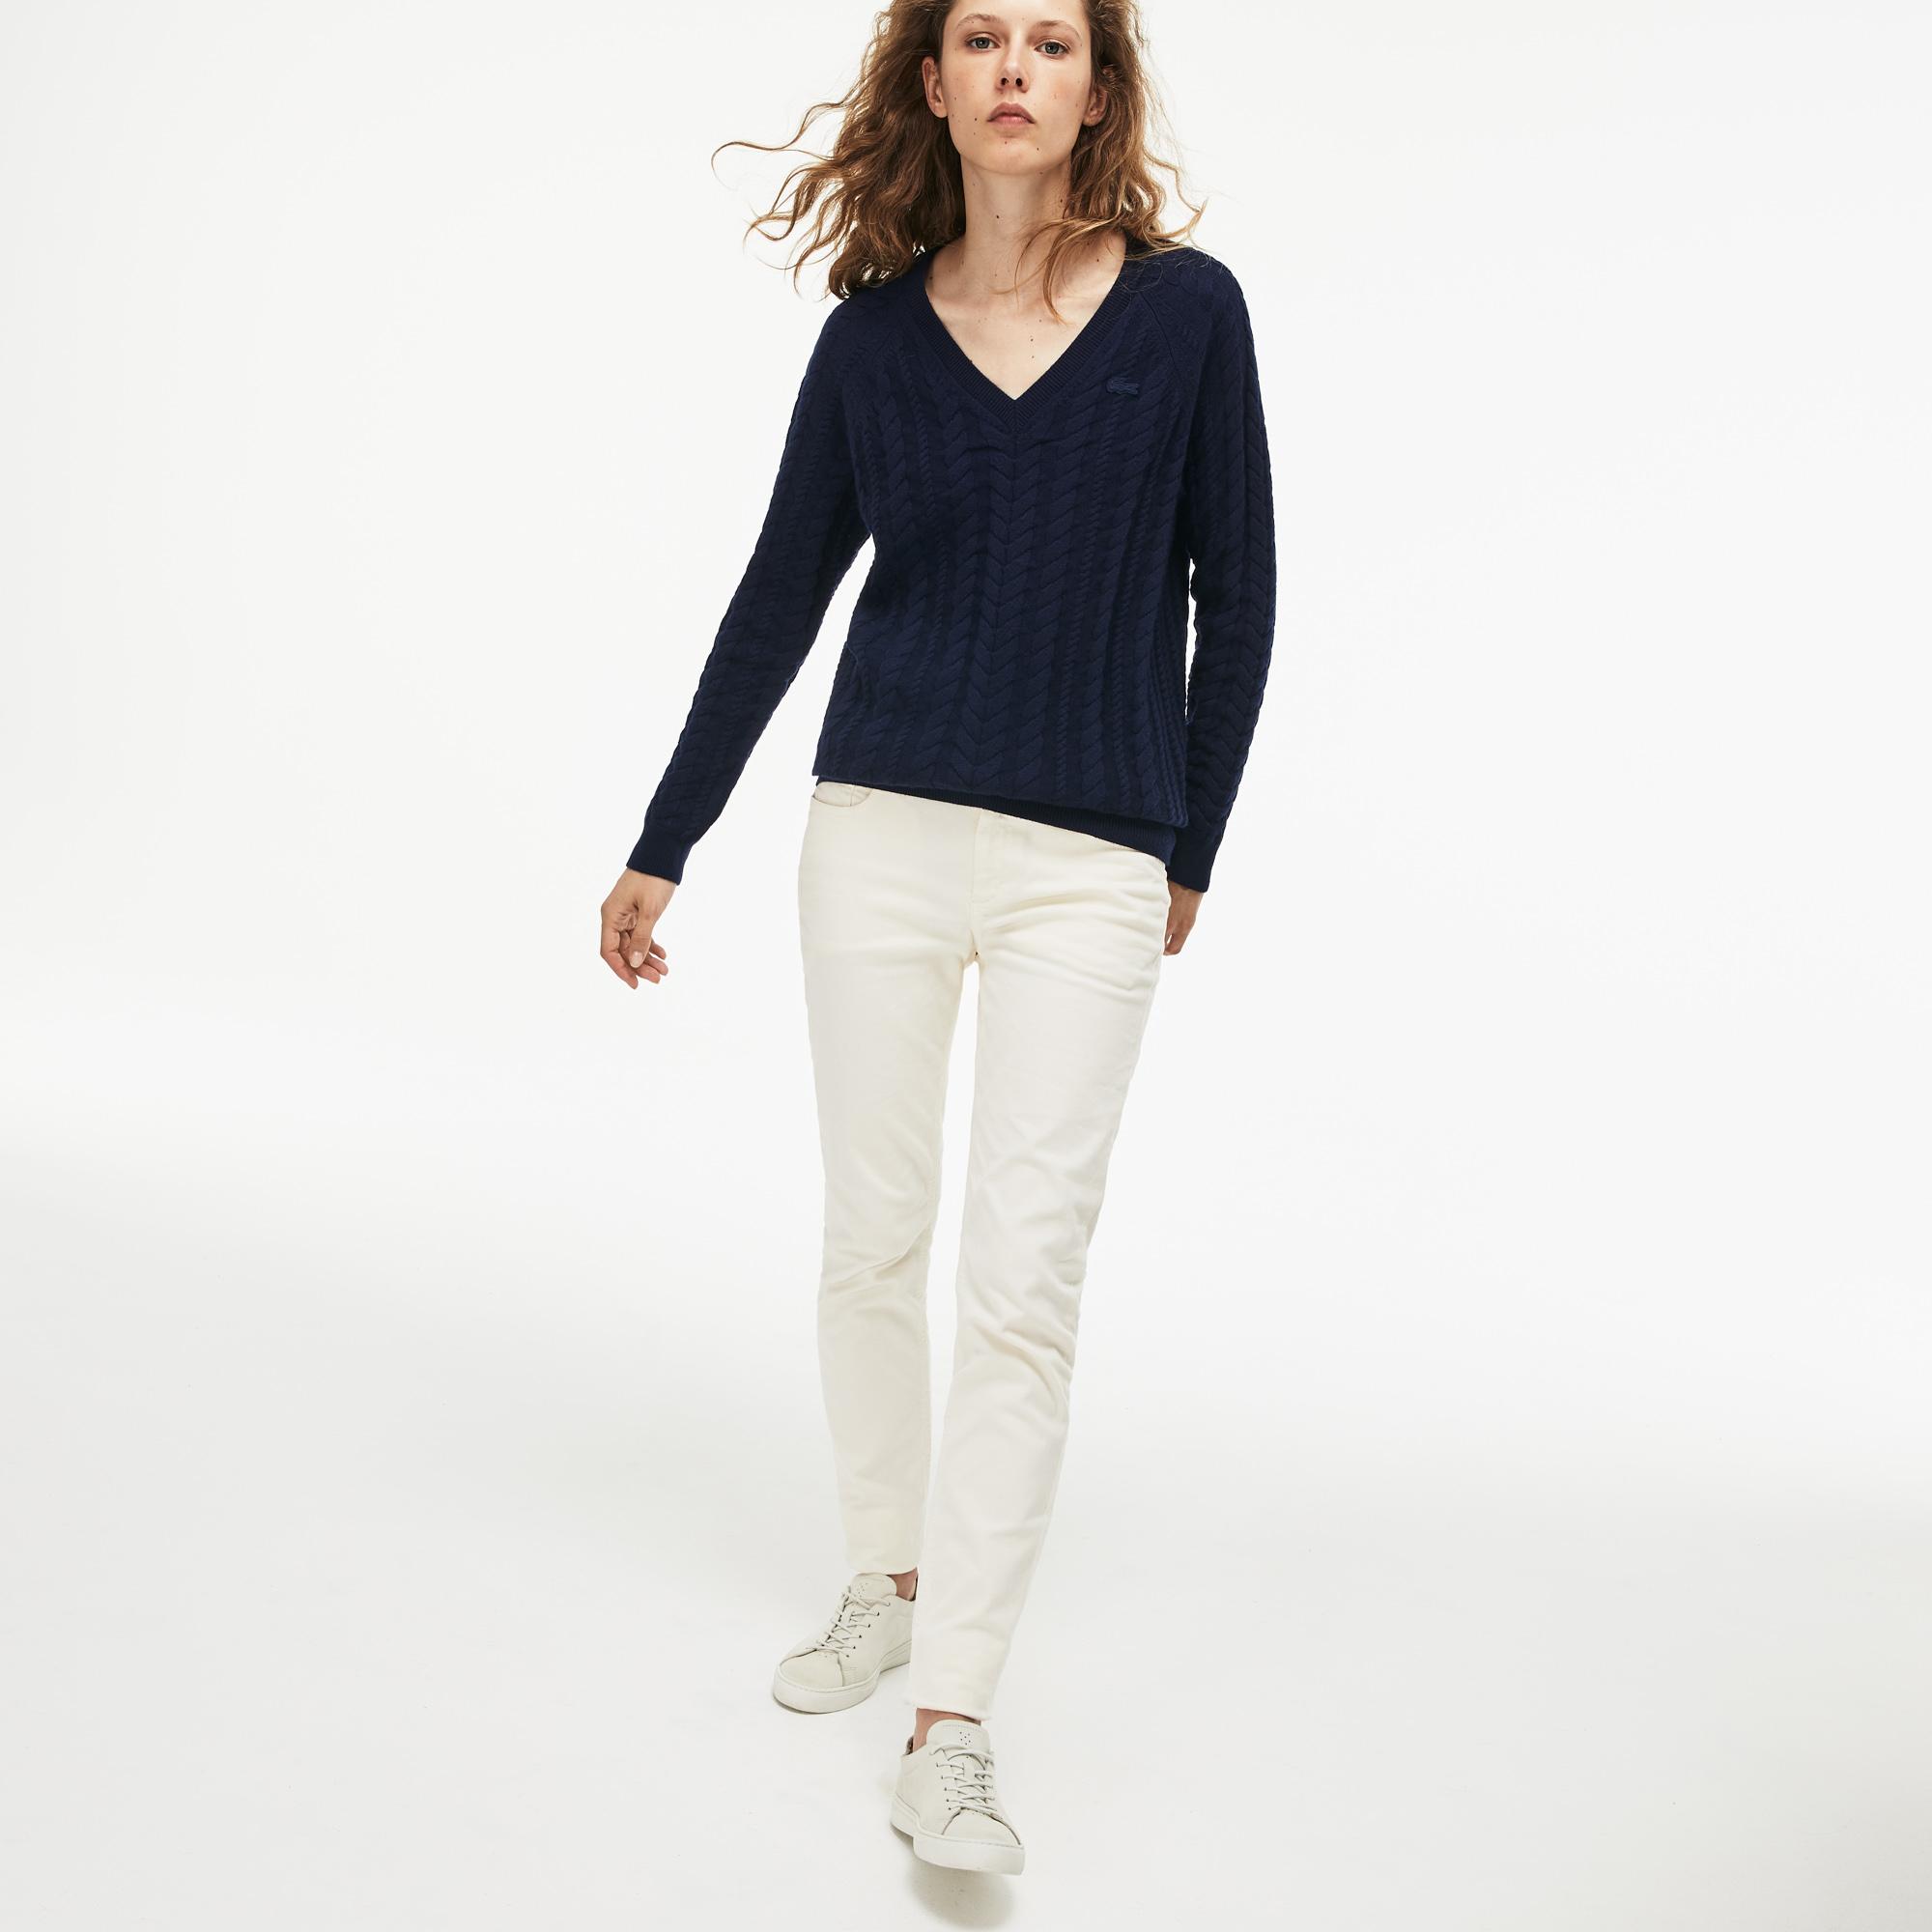 Фото 2 - Женский свитер Lacoste темно-синего цвета